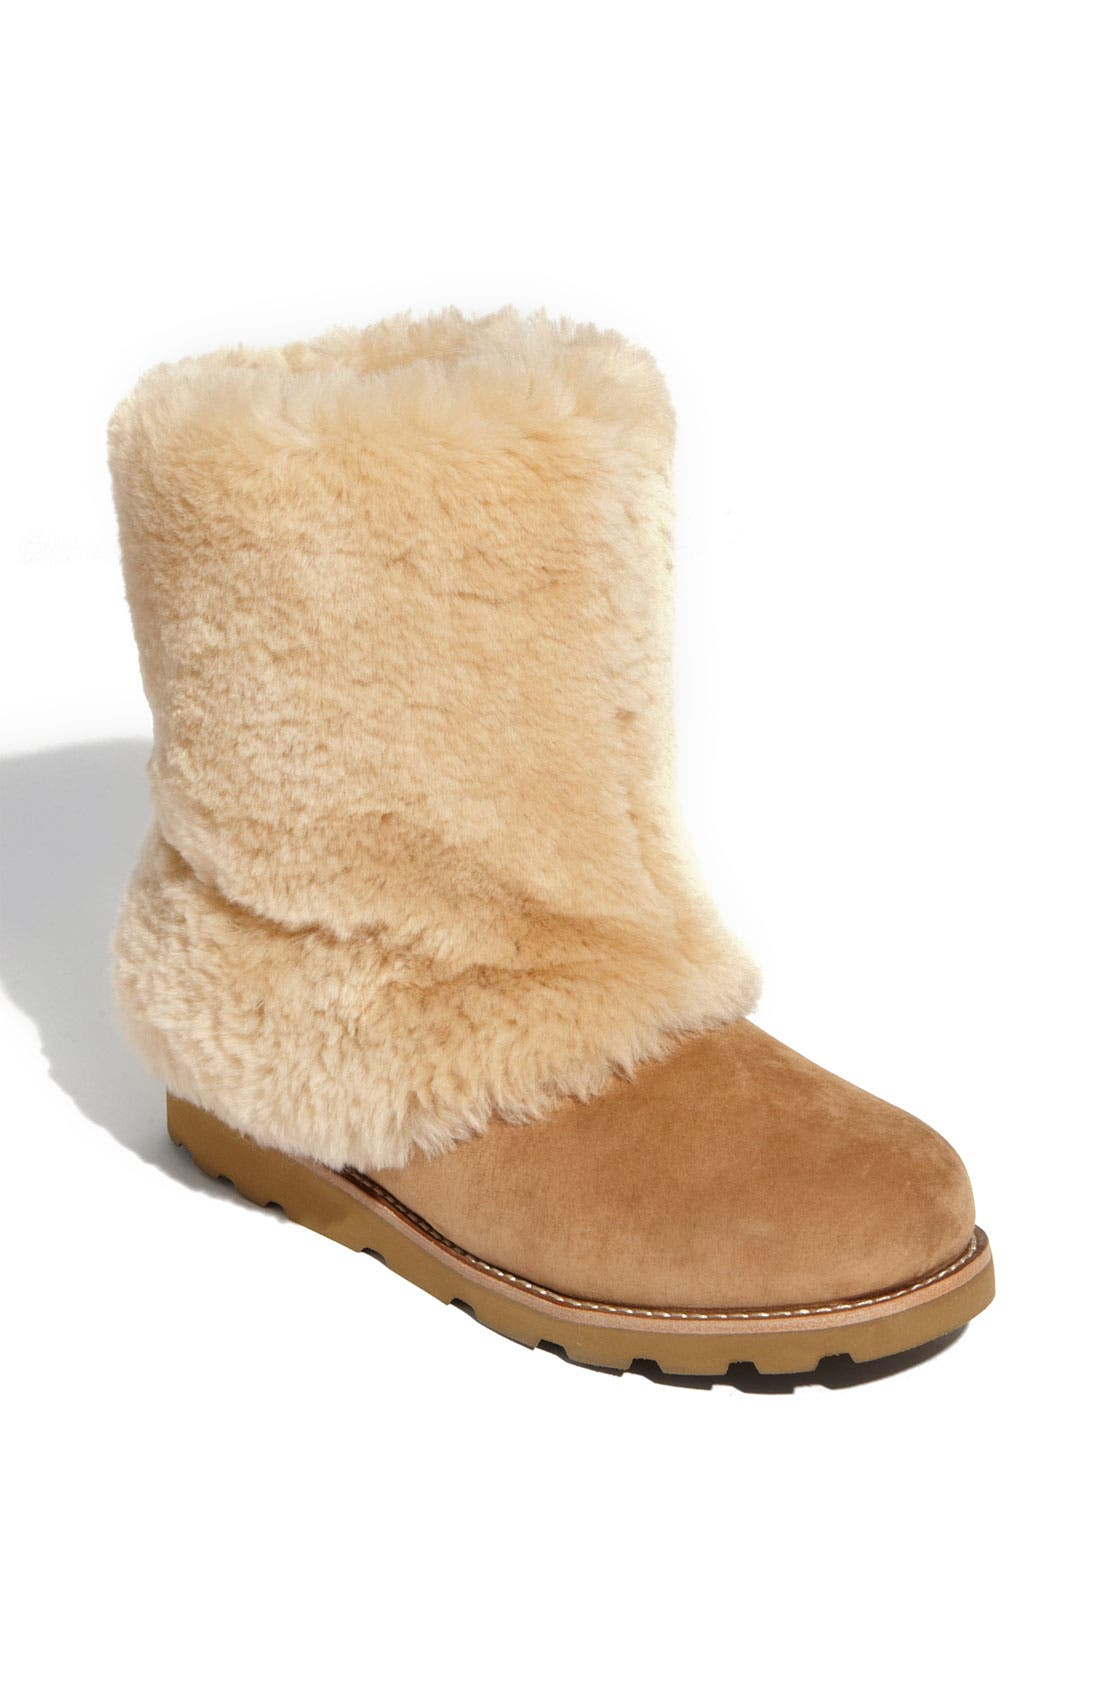 Main Image - UGG® Australia 'Maylin' Boot